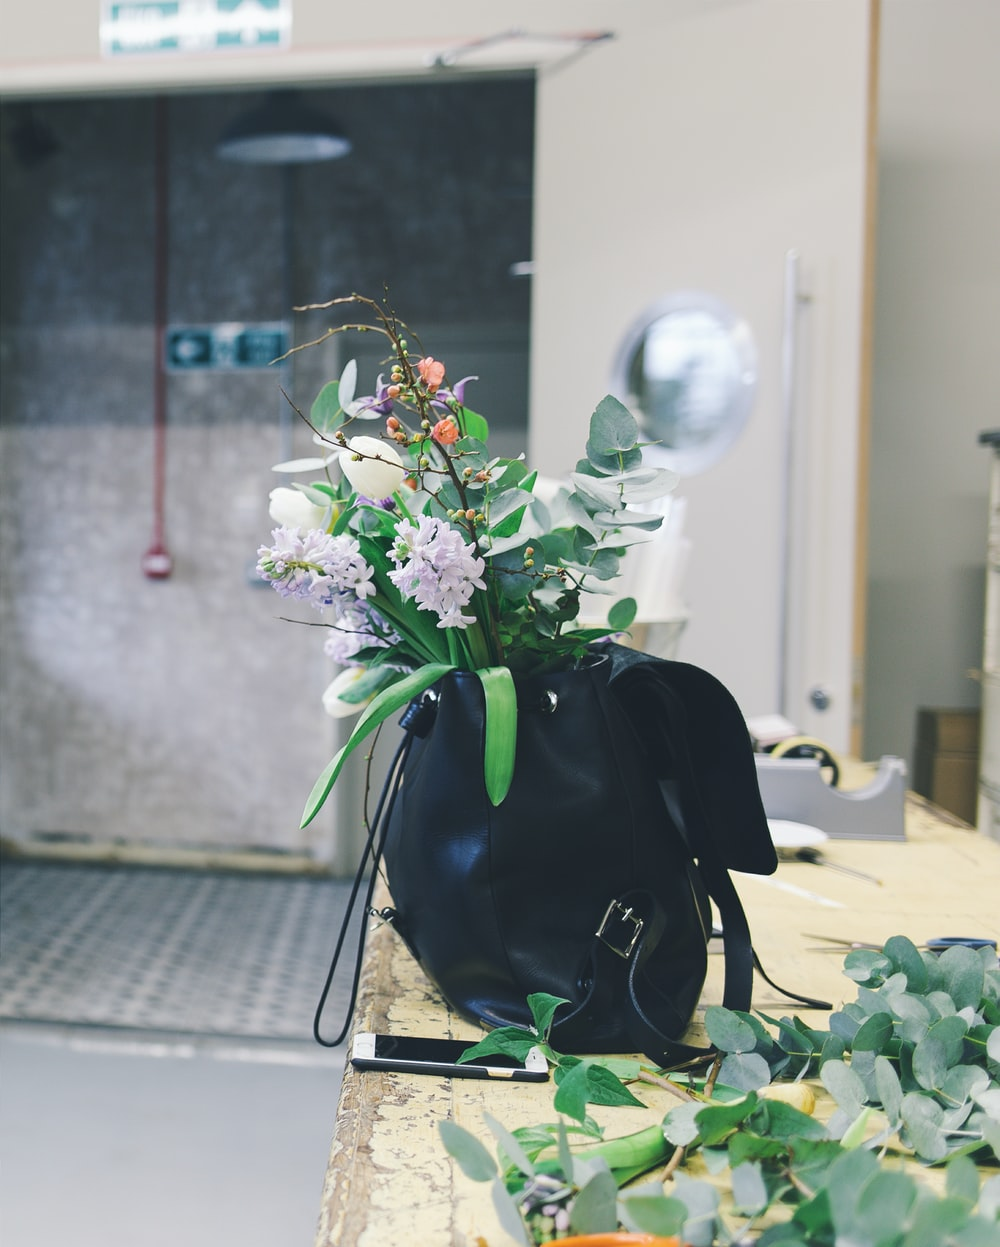 Floral Arrangement Pictures | Download Free Images on Unsplash